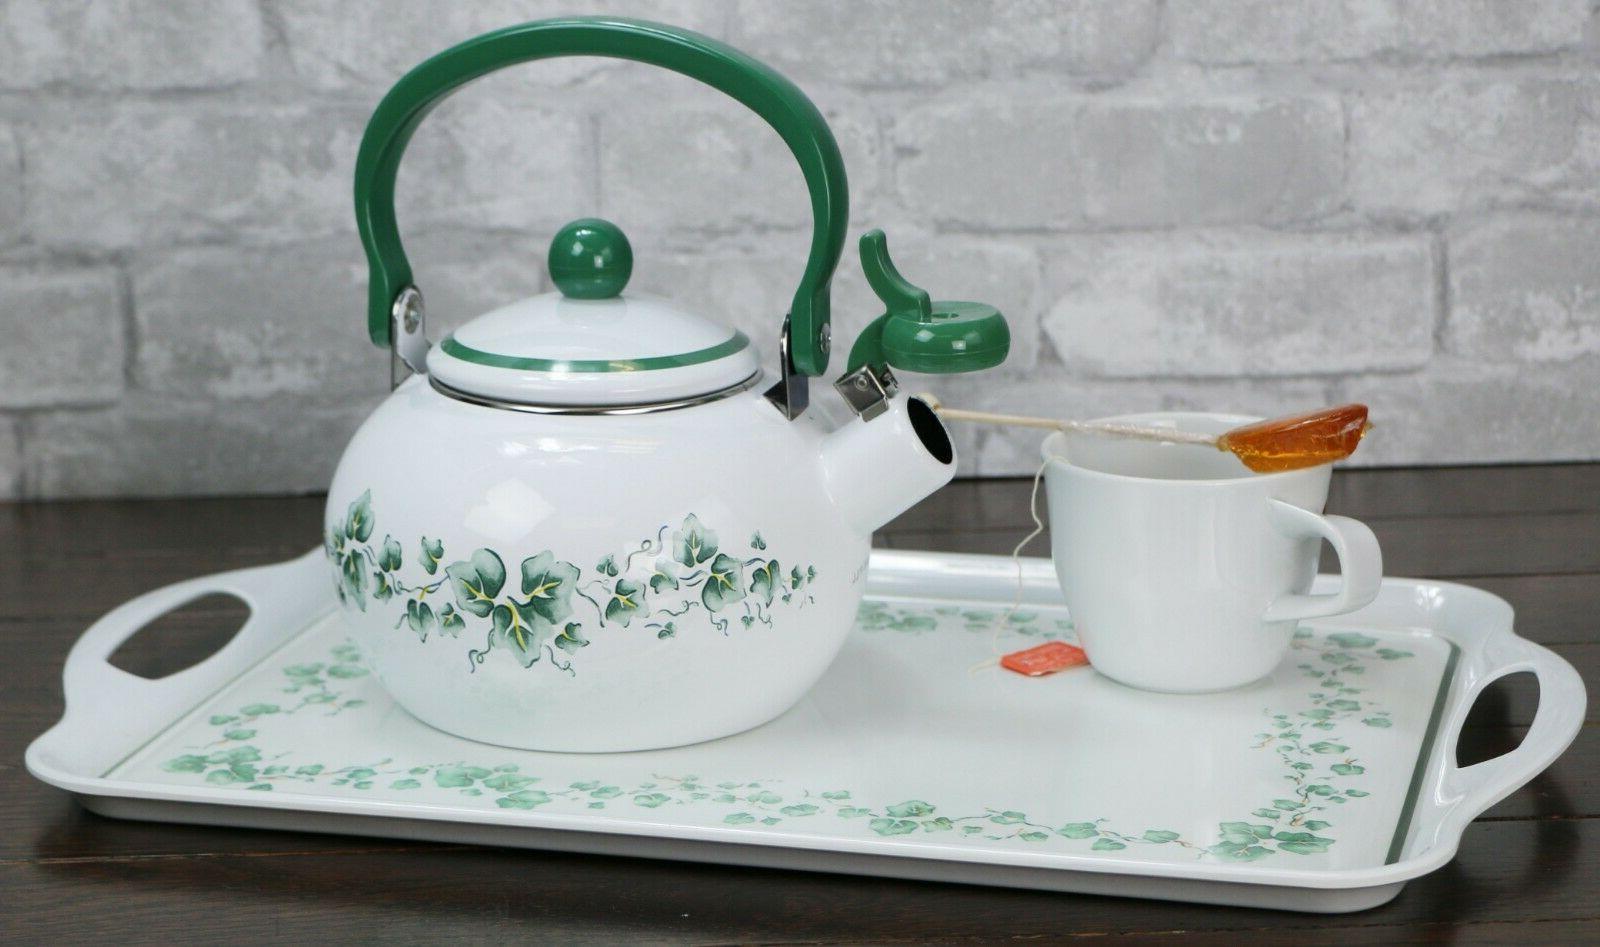 CORELLE TEA KETTLE Safe *Choose NEW